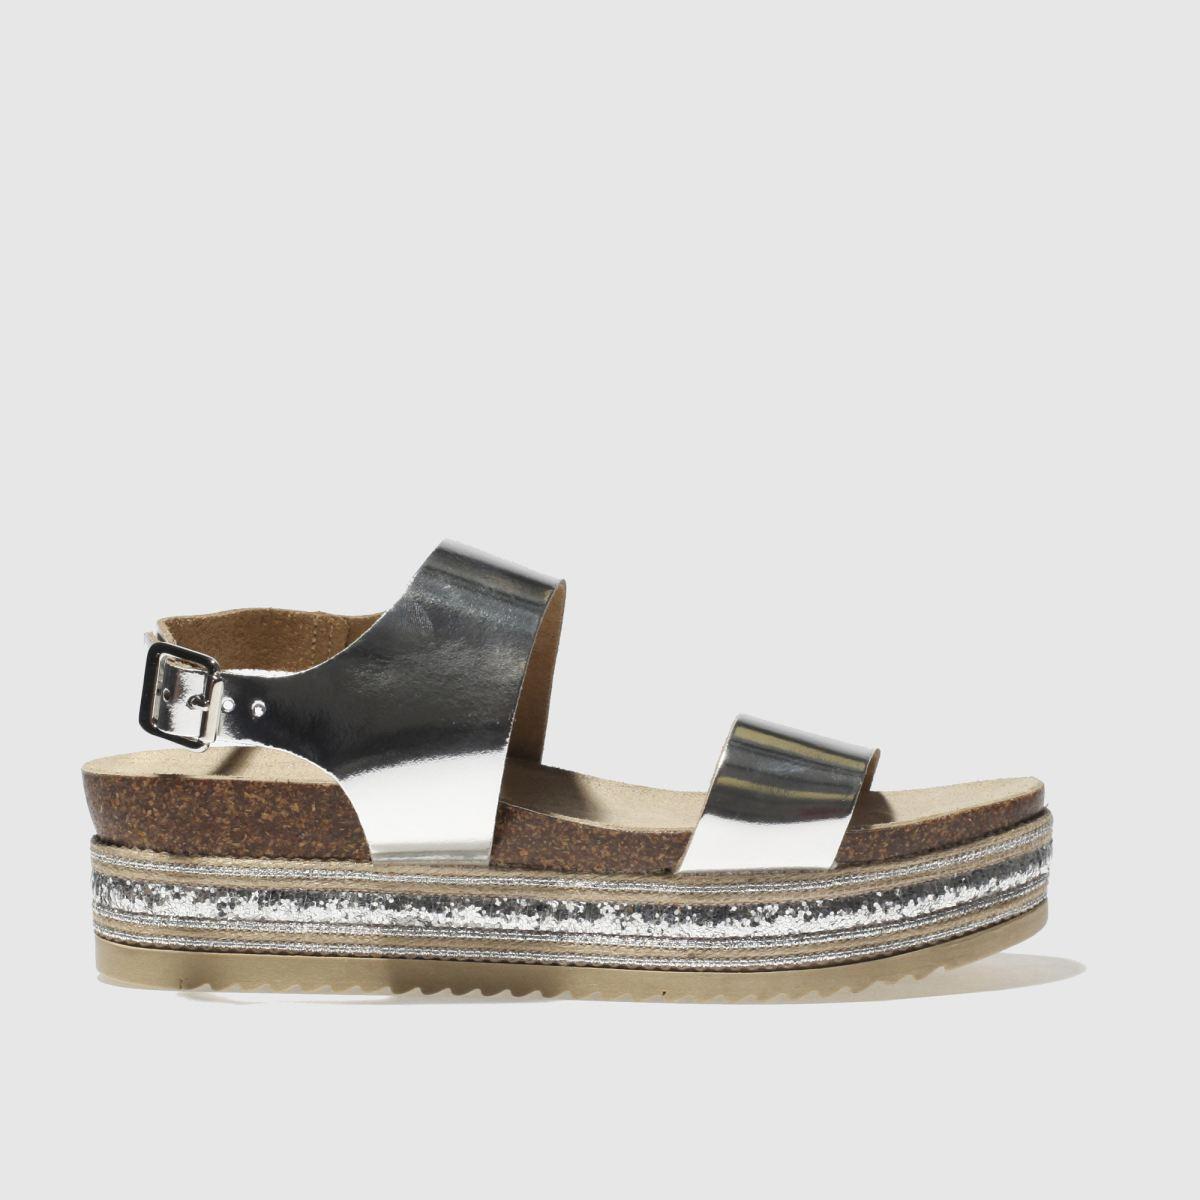 Schuh Silver Orlando Sandals